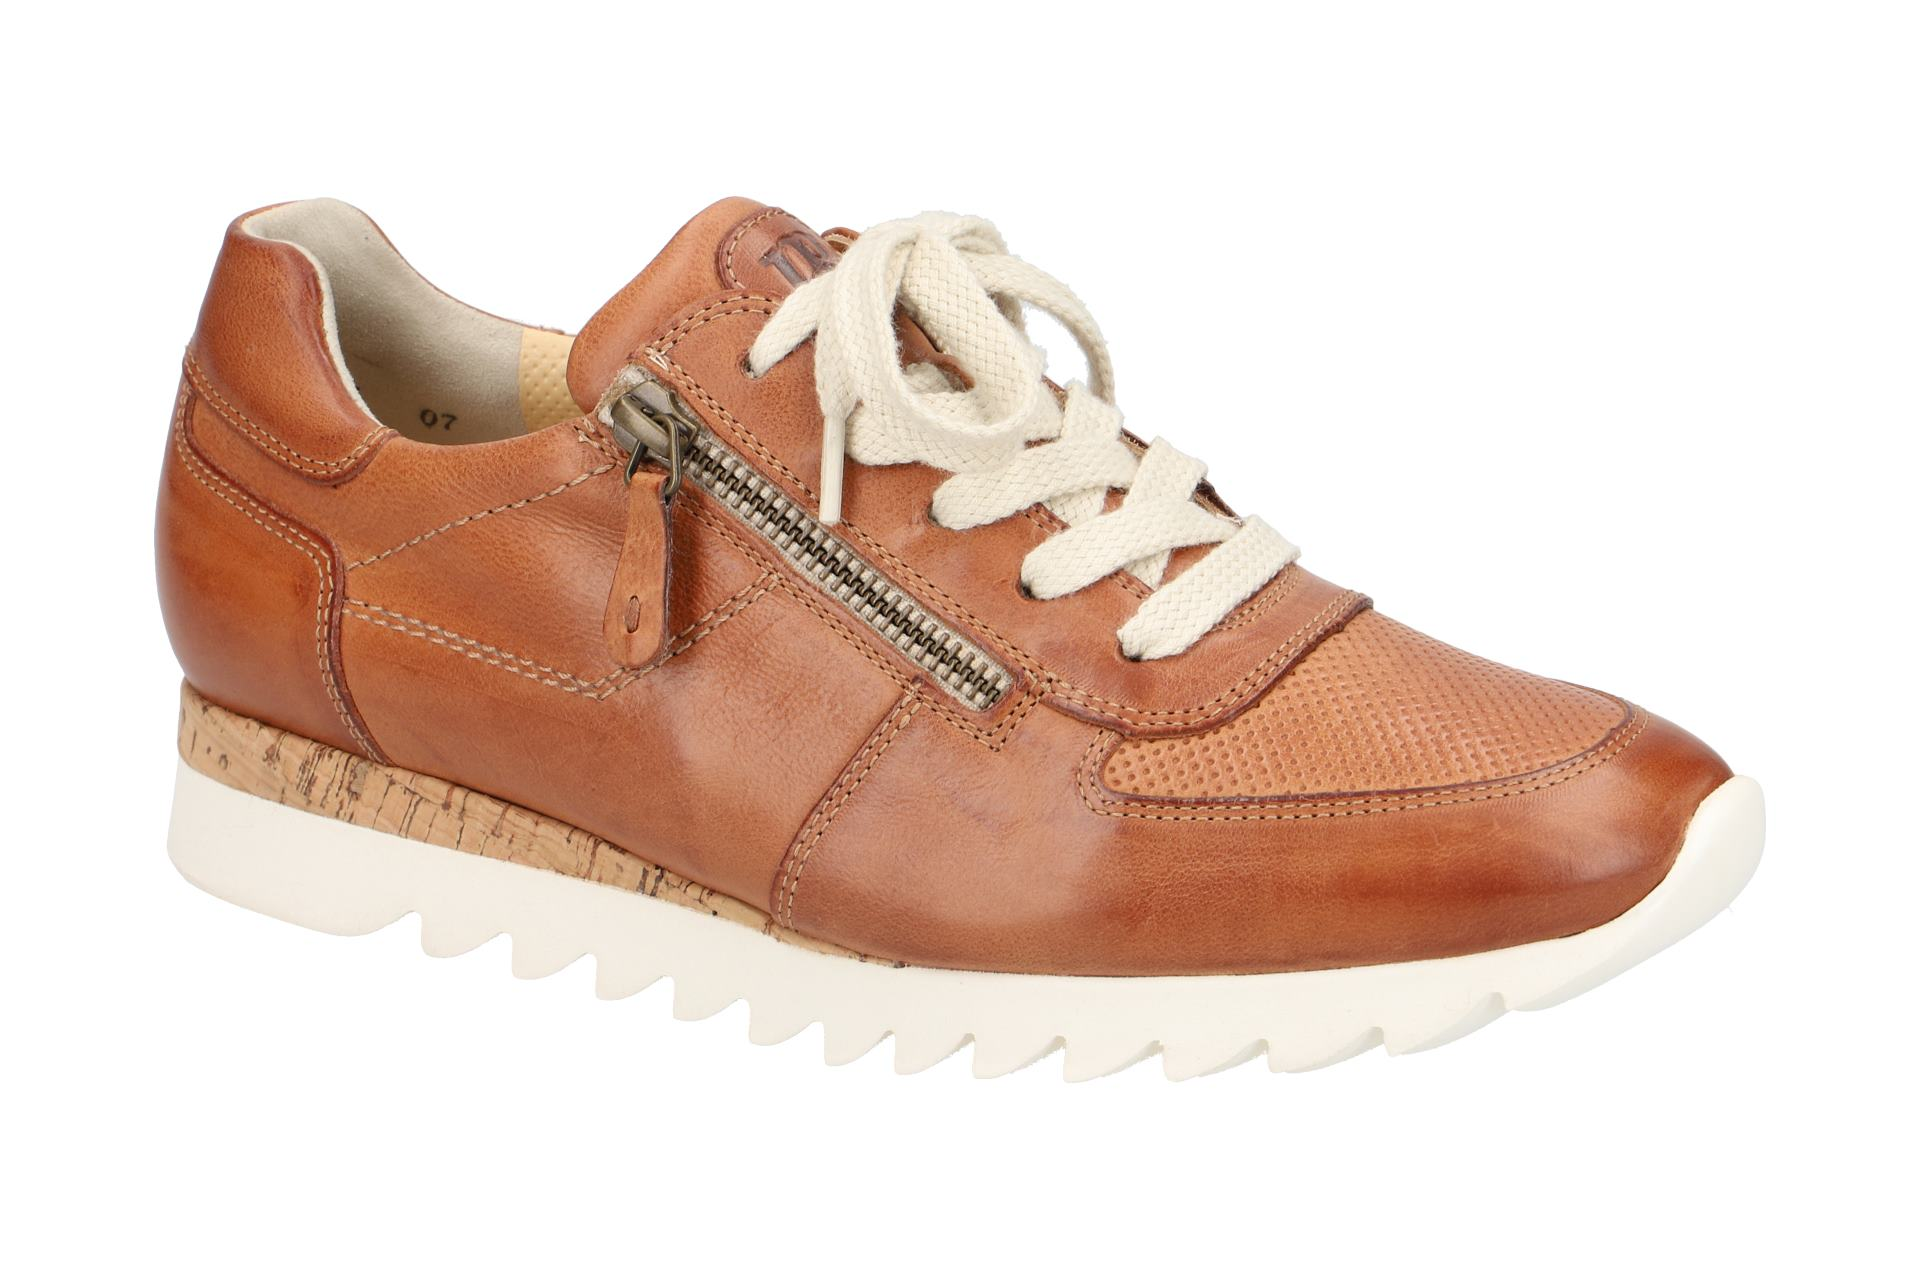 best service beff0 e4f97 Paul Green Schuhe Sneaker braun 4485-072